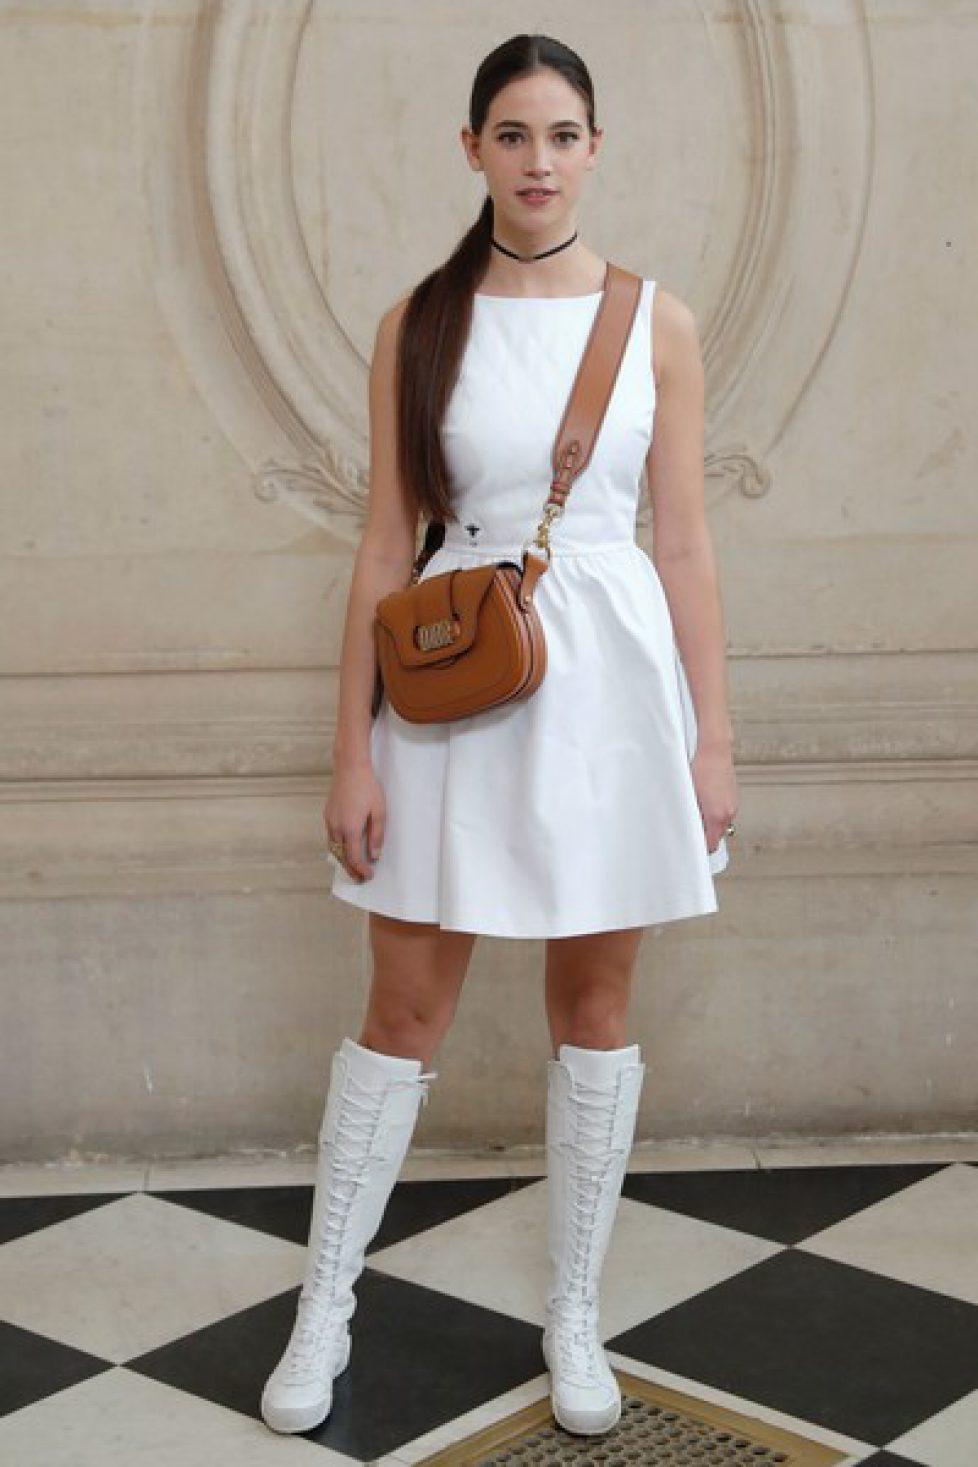 Christian+Dior+Outside+Arrivals+Paris+Fashion+hwnoea2a4xSl